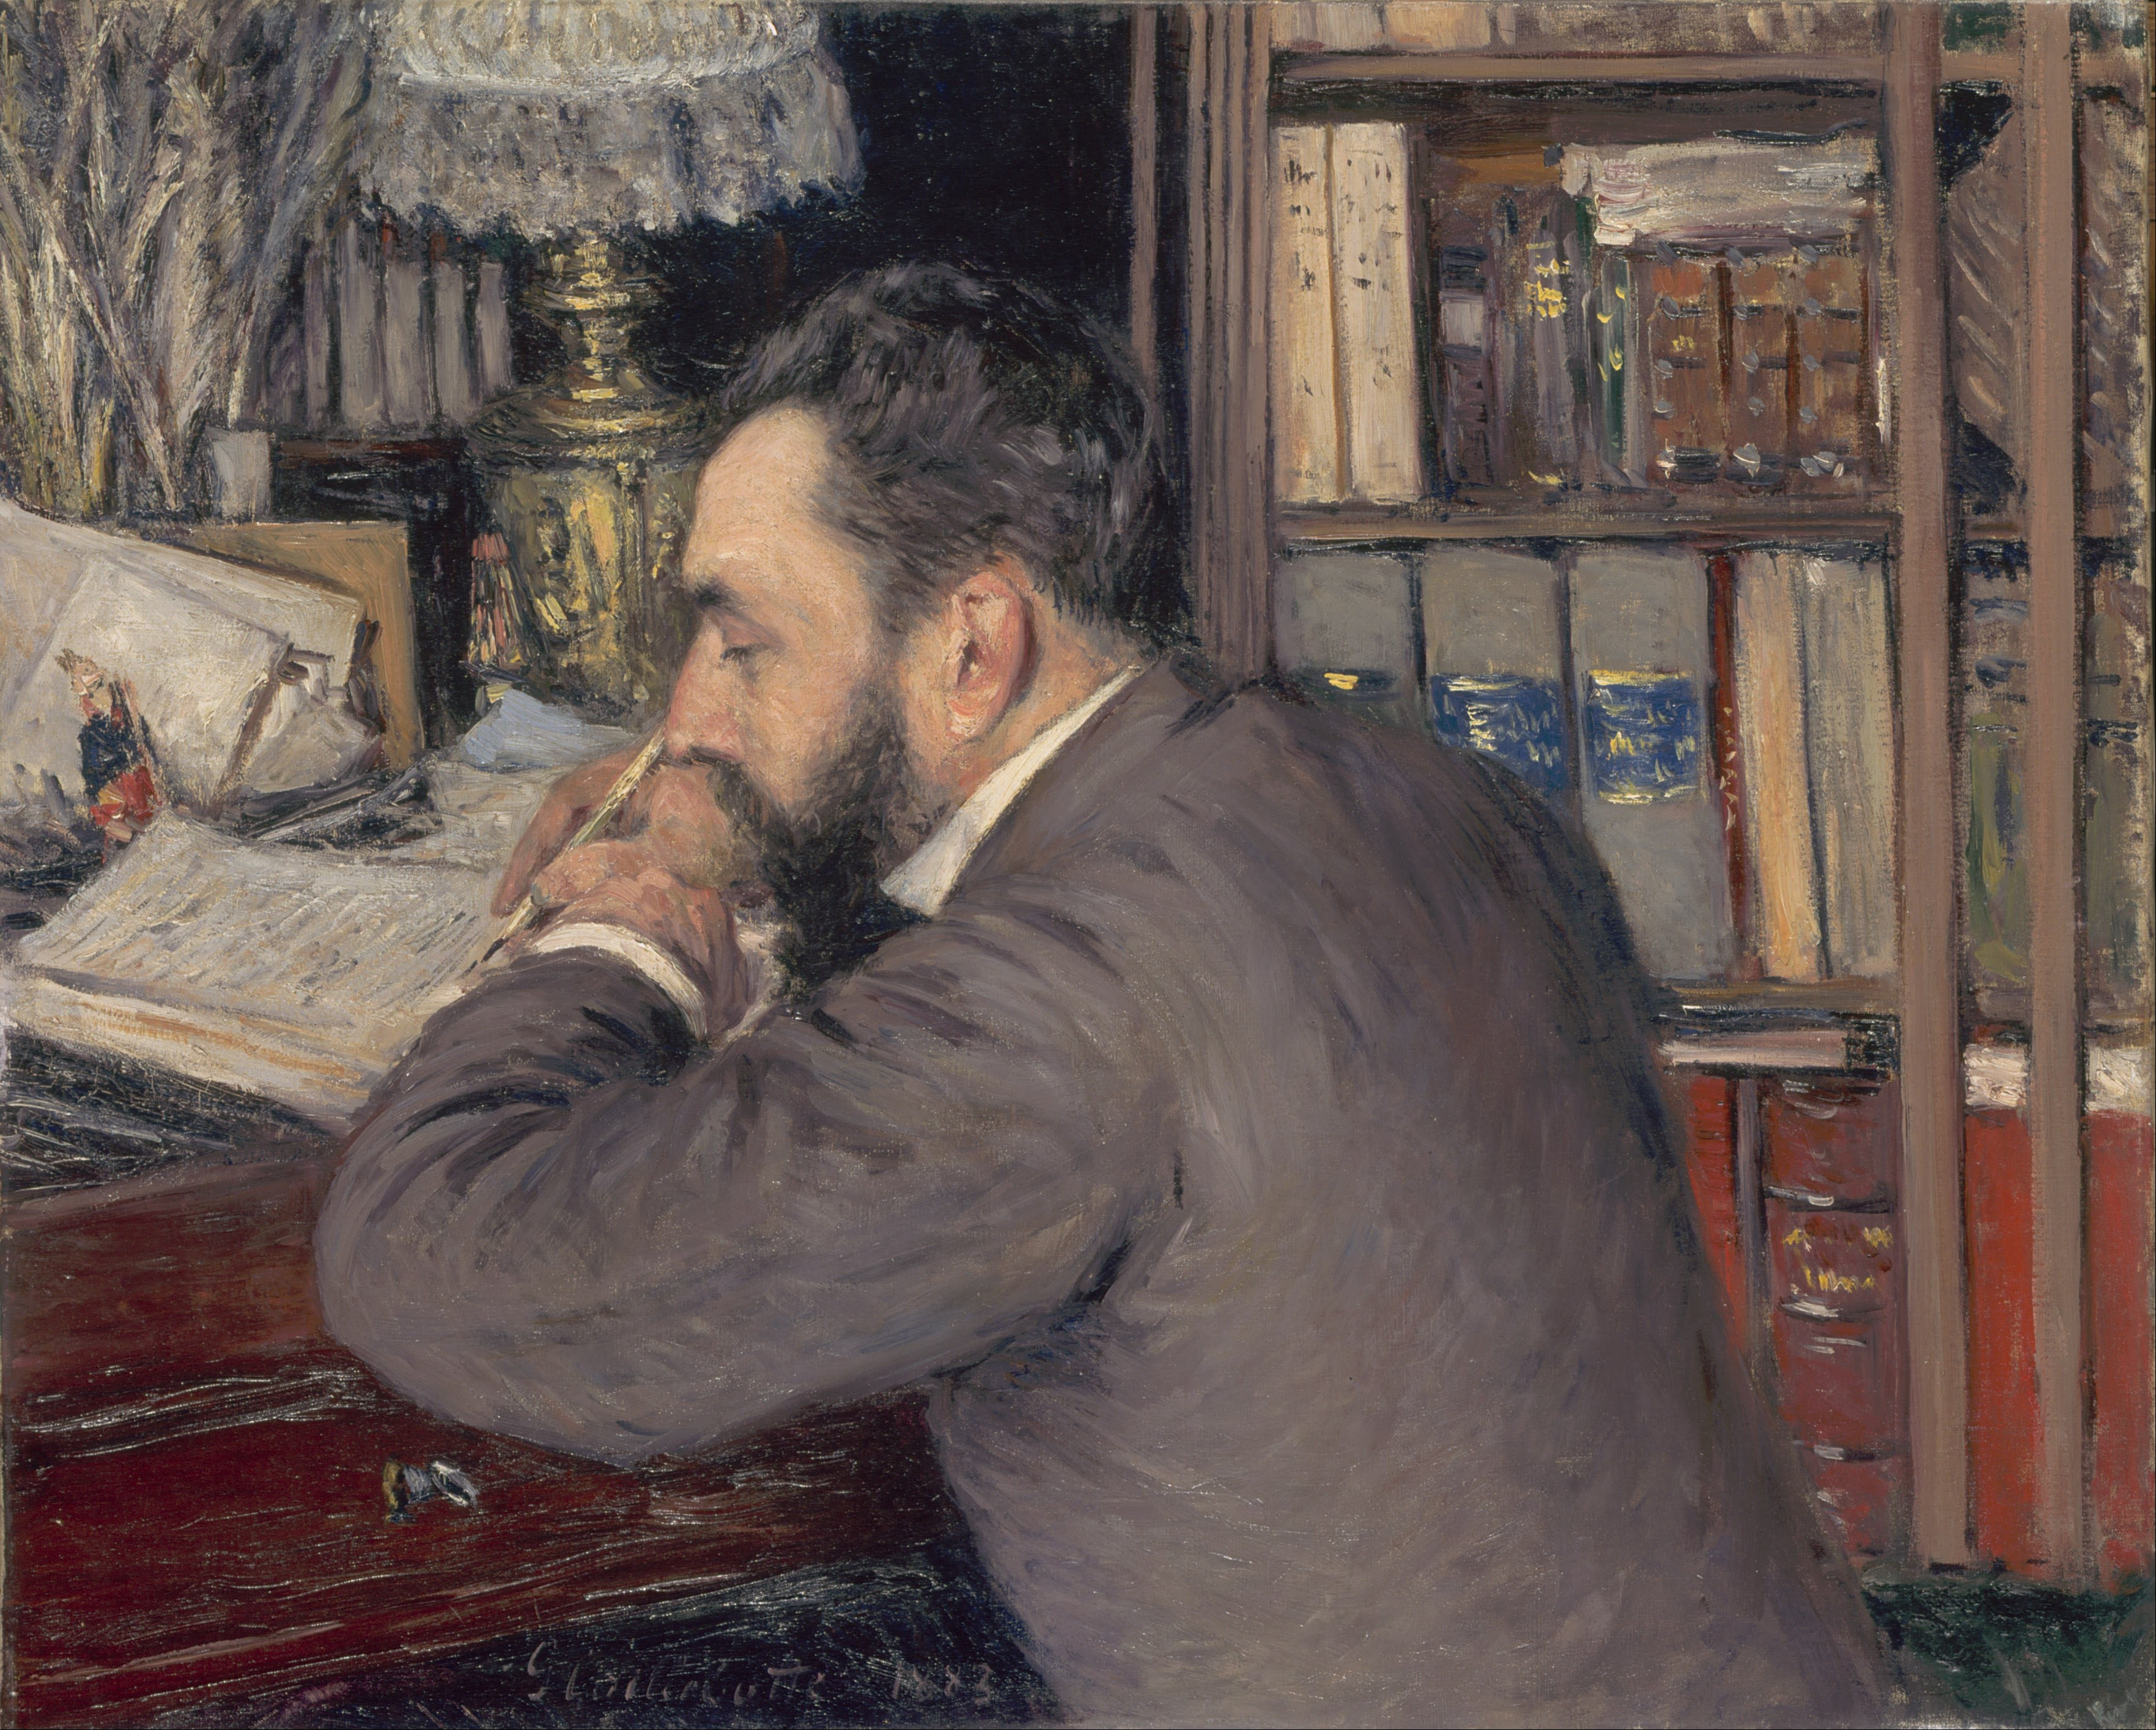 Gustave_Caillebotte_-_Henri_Cordier_-_Google_Art_Project.jpg